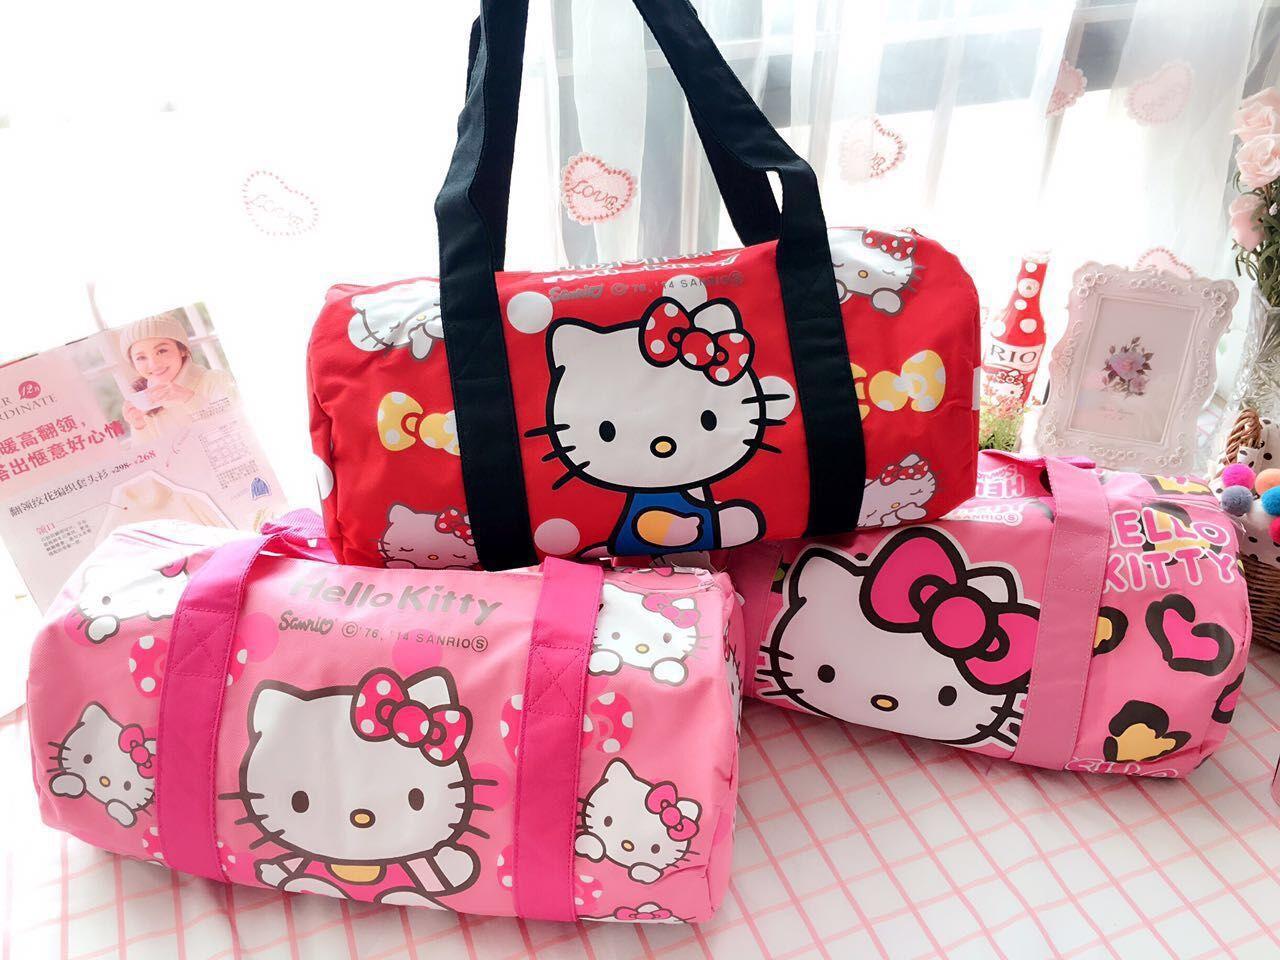 c4606e38f4f3 Cartoon Hello Kitty Melody Doraemon Twin Star Handbags Women Travel Bags  Girls Shoulder Bag Big Capacity Travel Bag Canvas Tote Personalized Bags  Fashion ...